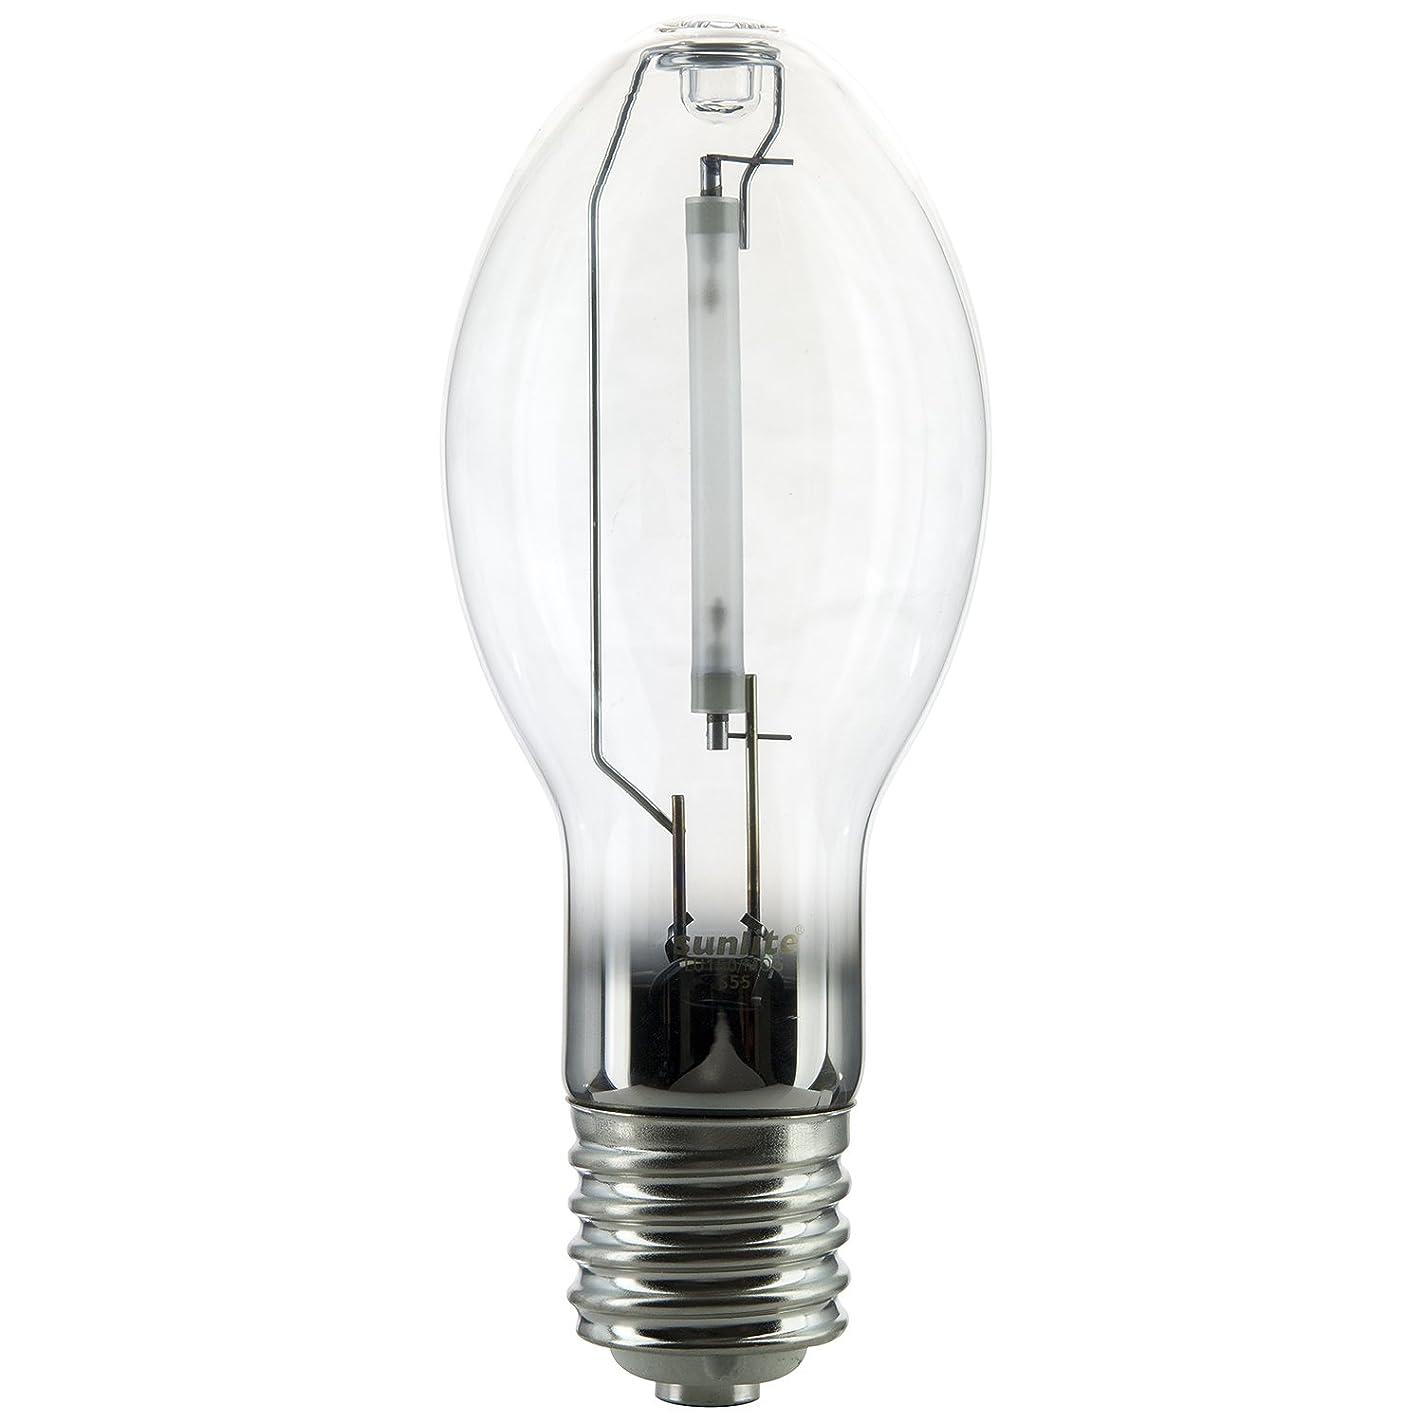 Sunlite 03635-SU LU150/MOG 150 Watt HPS ED23 High Pressure Sodium Light Bulb, Mogul Base, Clear